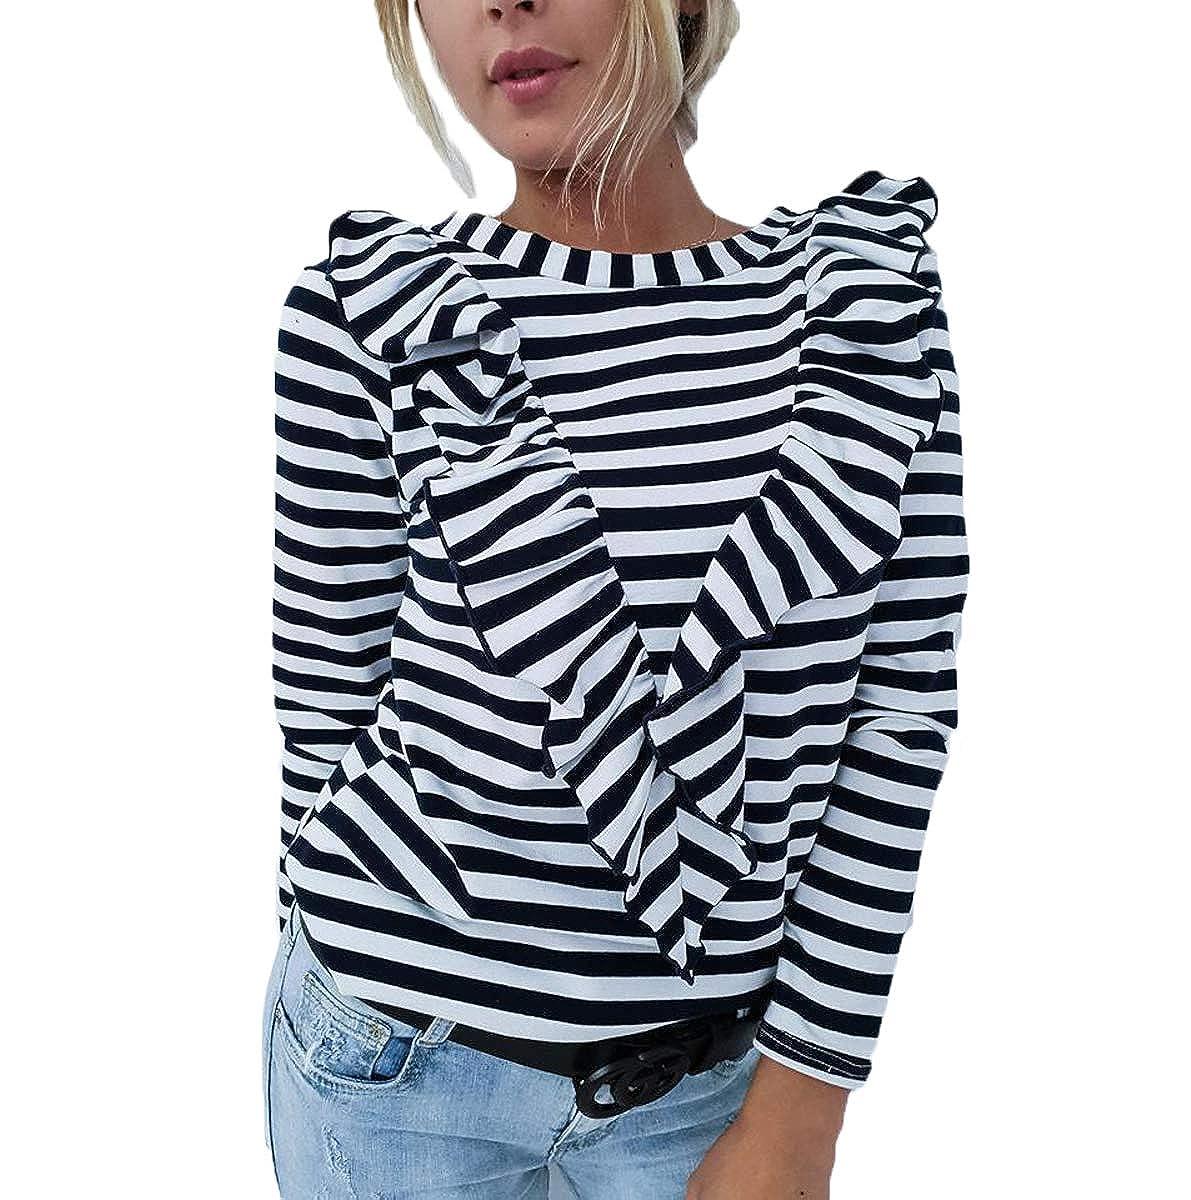 itifu Women Stripe Tees V-Shape Ruffle Round Neck Long Sleeve T-Shirt Tunic Blouse Top